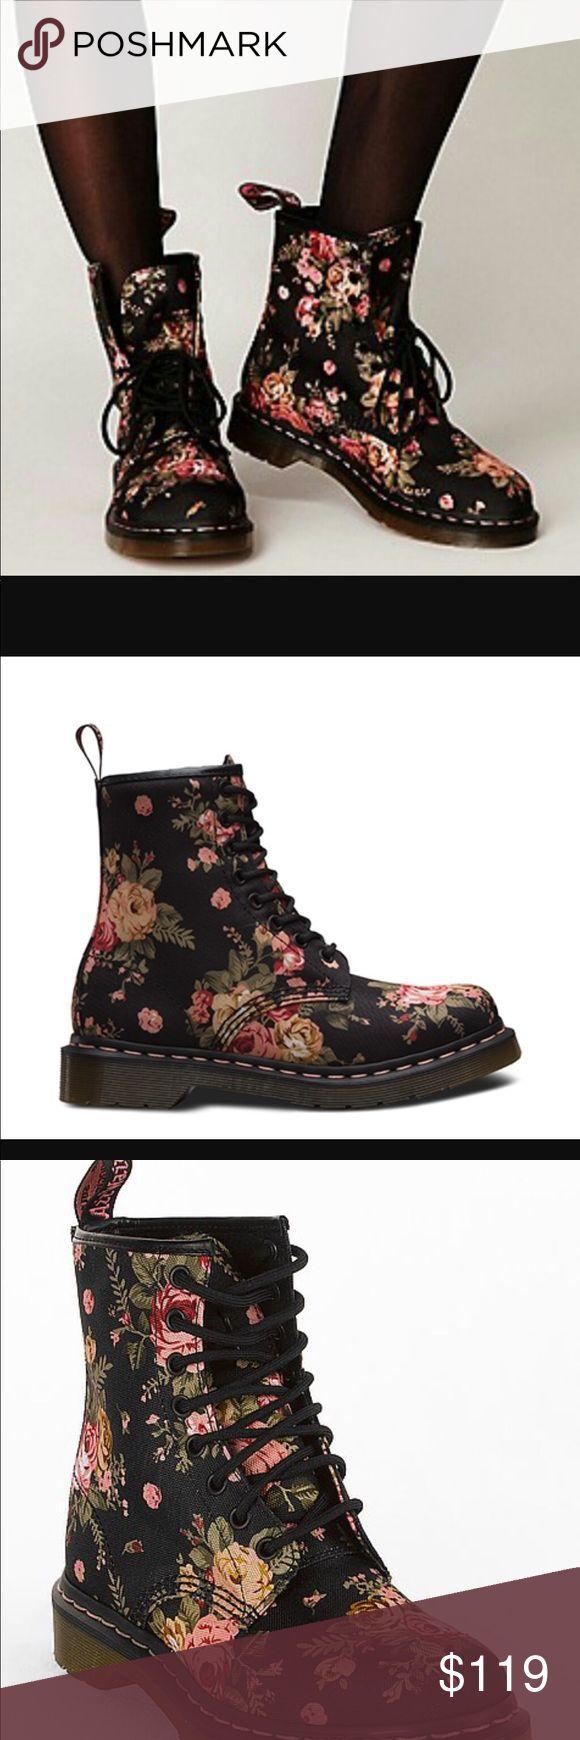 FLASH SALE Dr. Martens Floral Boots. Size 10 Brand new!! So cute Dr. Martens Shoes Lace Up Boots